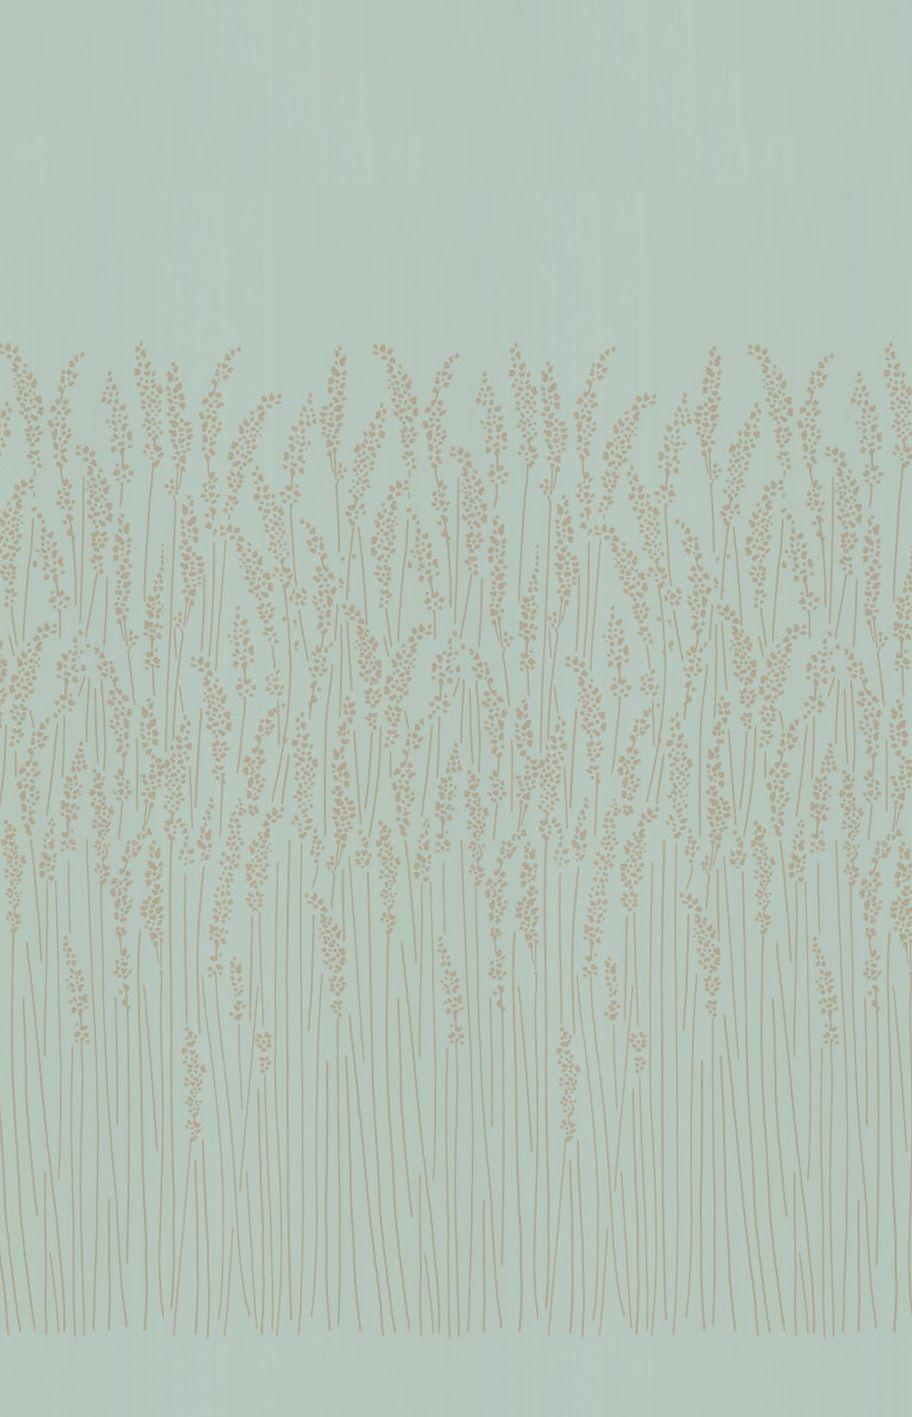 Feather Grass Blue By Farrow Ball Wallpaper Brewers Home